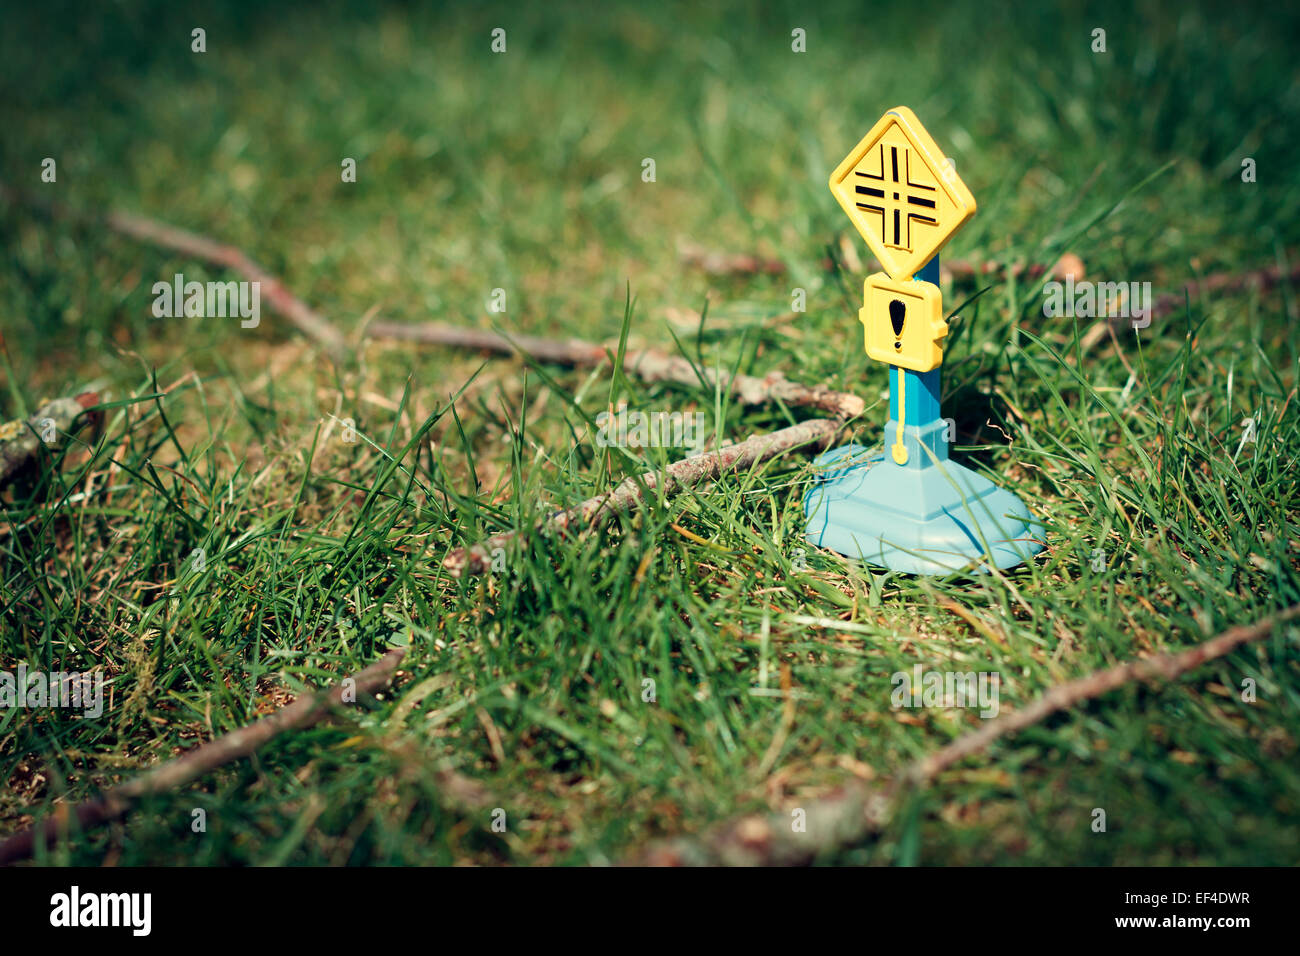 Straße Zeichen Spielzeug Rasen Makro-Fotografie Stockbild